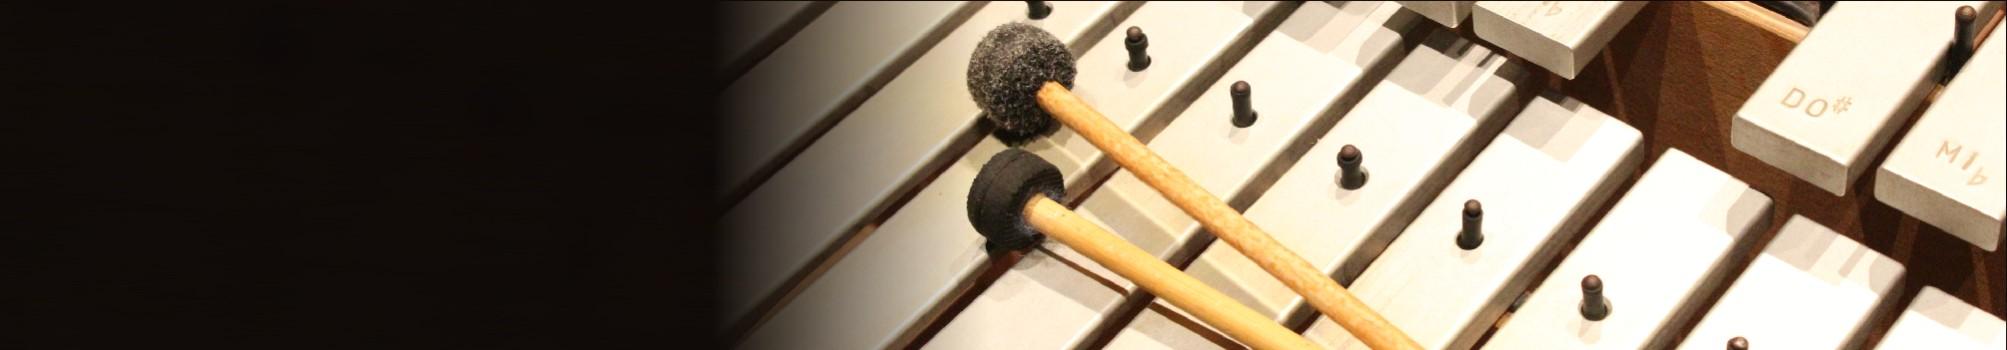 detalhe de xilofone